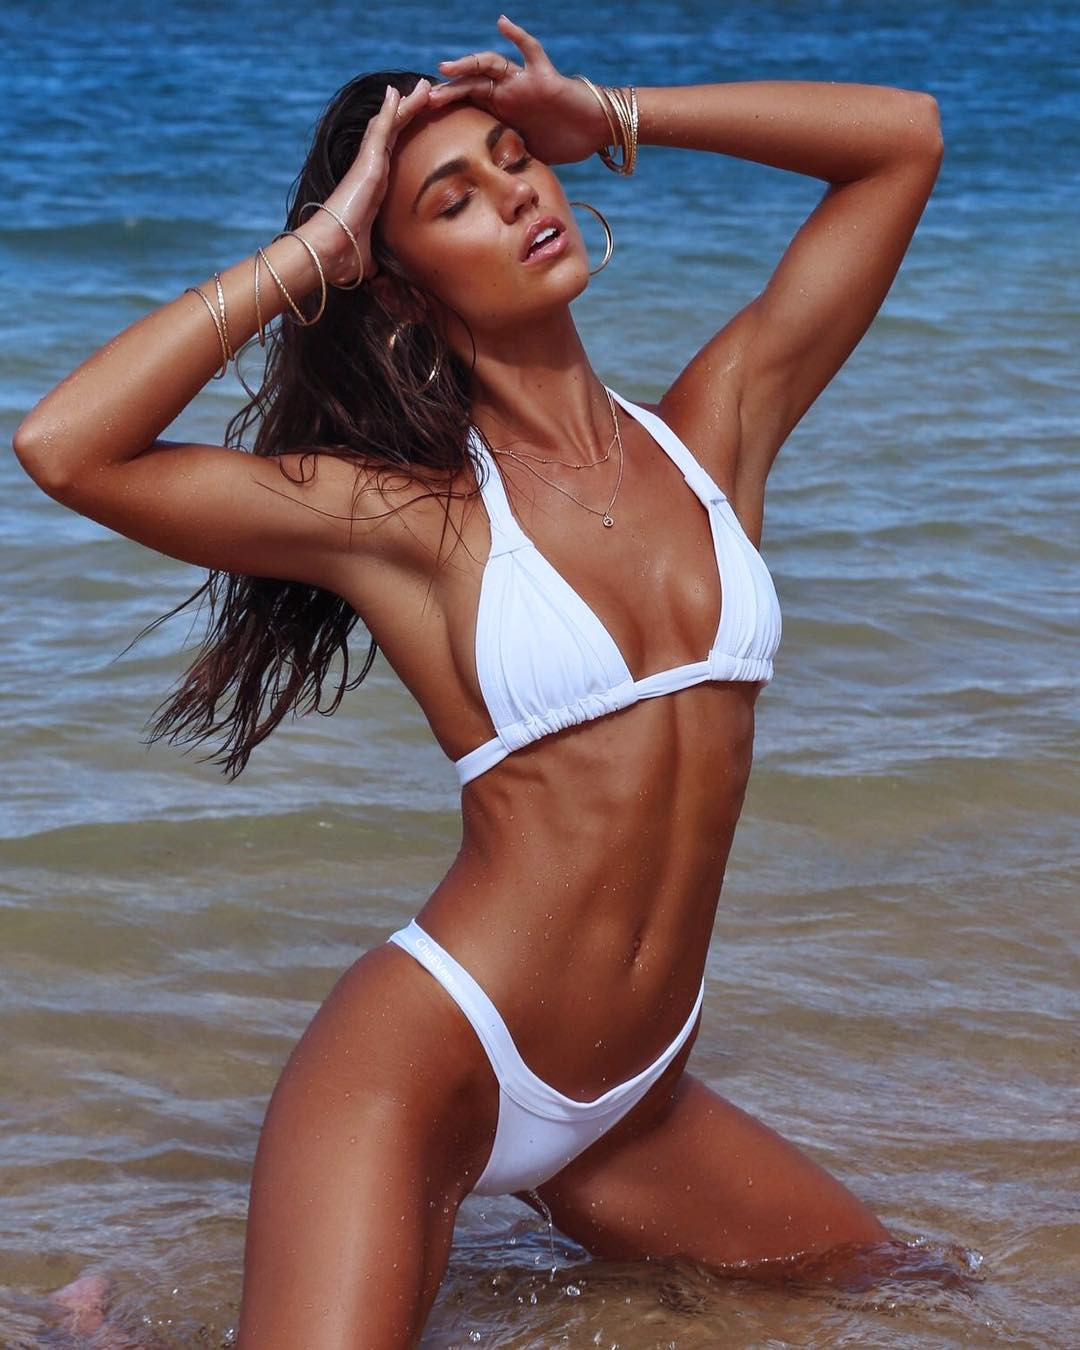 Hot 4 colors Swimwear Women Bikini Set 2018 Bandage Swimsuit Sexy solid Bikinis Maillot De Bain Feme Summer Bathing Suit Biquini